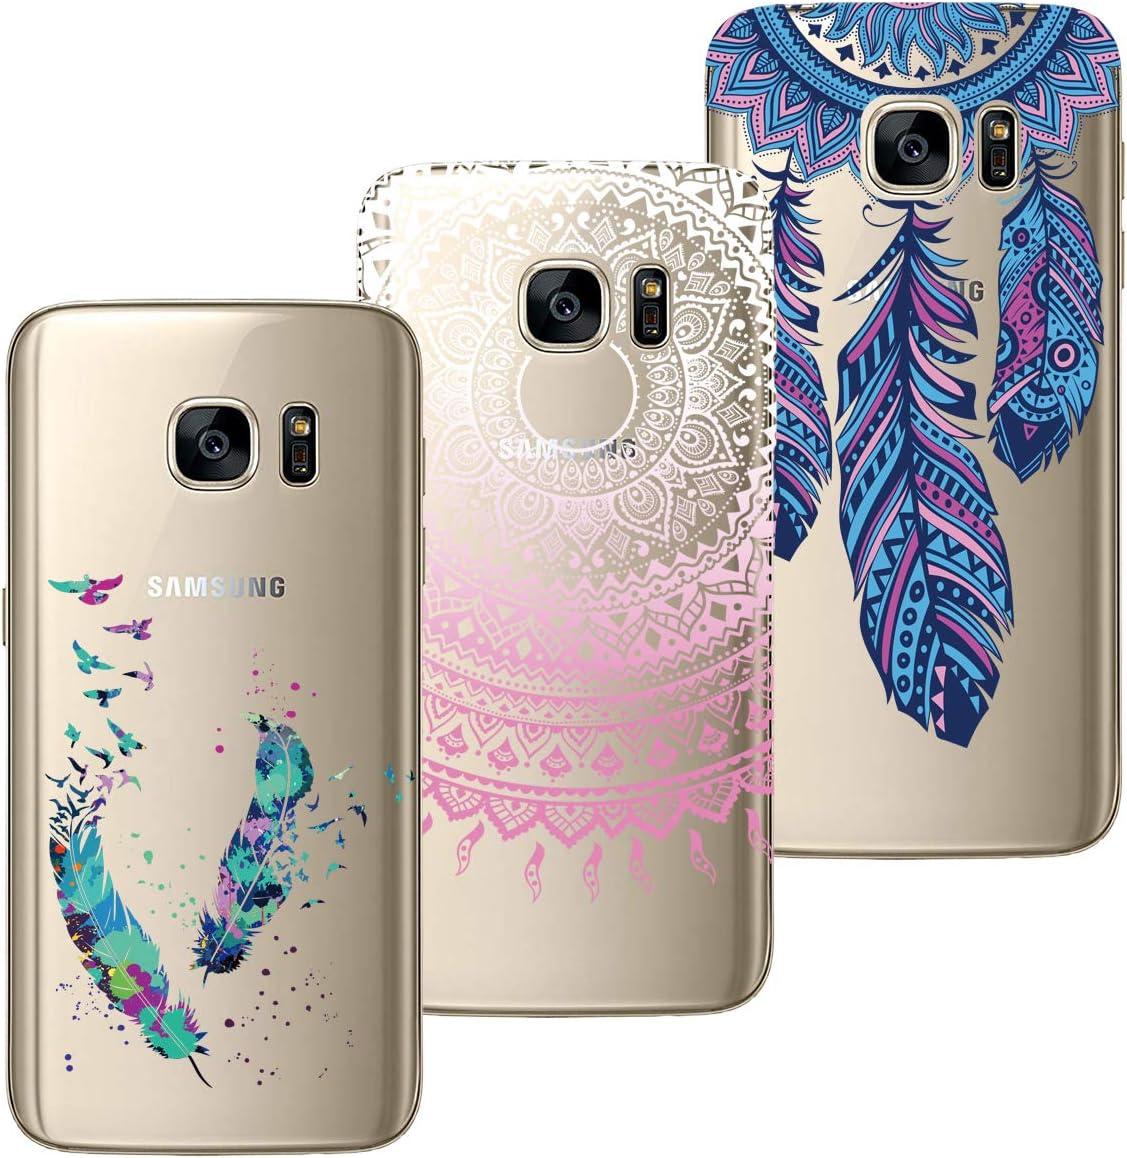 Kleiner Panda HopMore 3D Schutzh/ülle f/ür Samsung Galaxy S7 Edge H/ülle Silikon Tier Panda Einhorn Muster Ultra D/ünn Slim Handyh/ülle One Piece Silikonh/ülle Case Cover f/ür Samsung S7 Edge